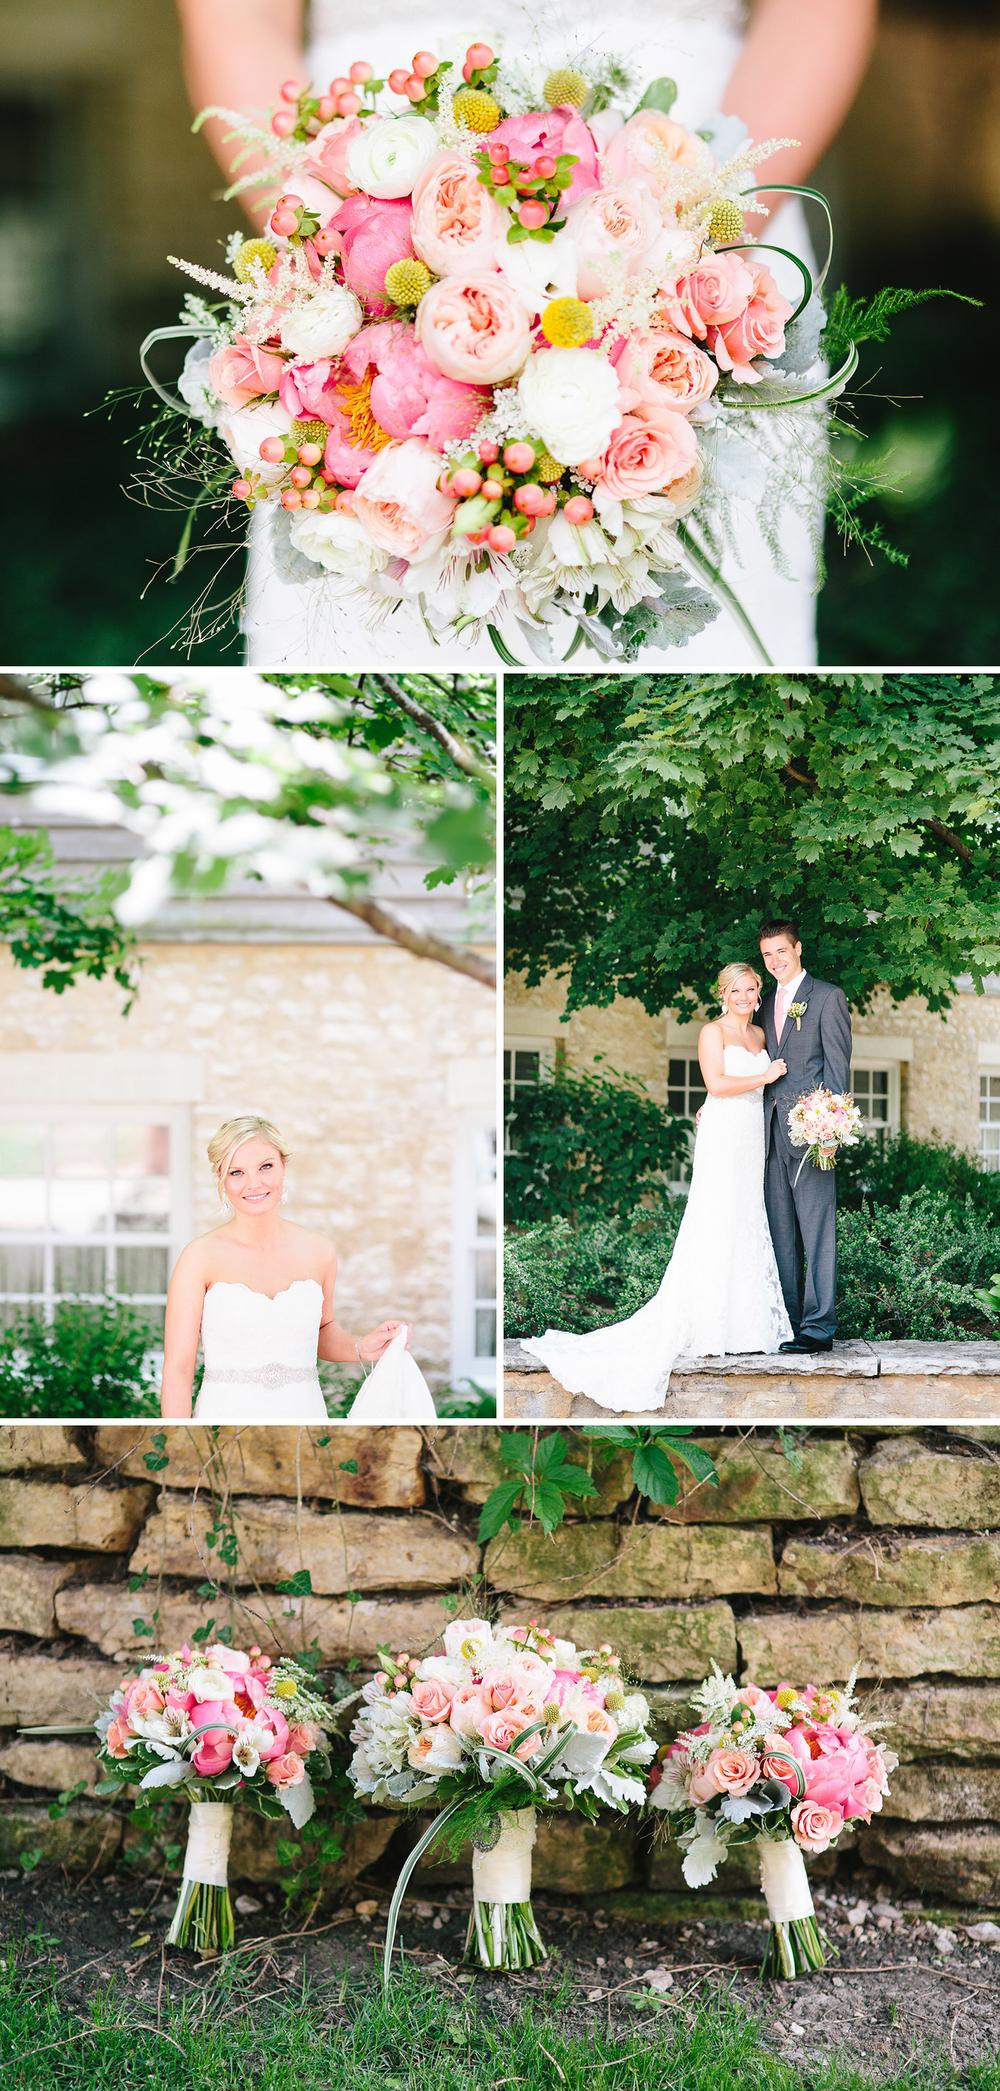 Chicago_Fine_Art_Wedding_Photography_larson1.jpg